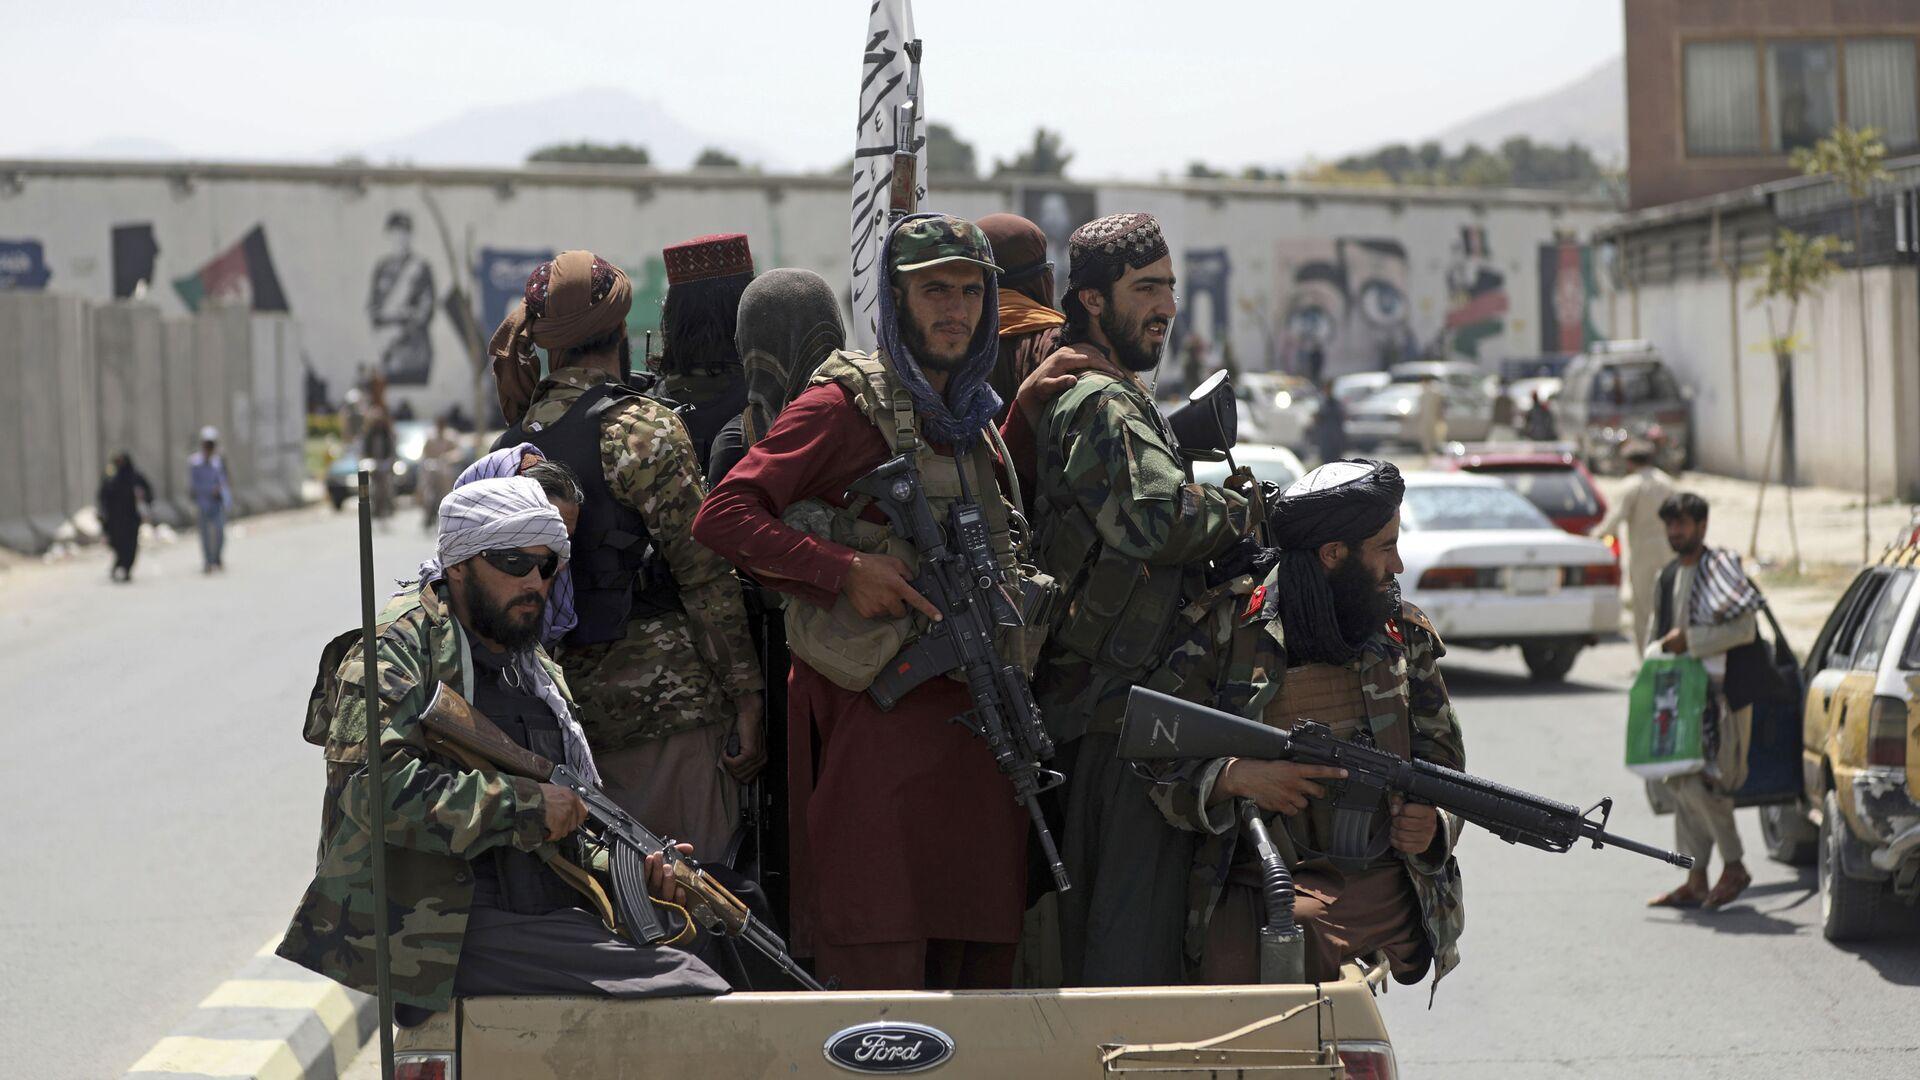 Các chiến binh Taliban* ở Kabul, Afghanistan - Sputnik Việt Nam, 1920, 22.08.2021